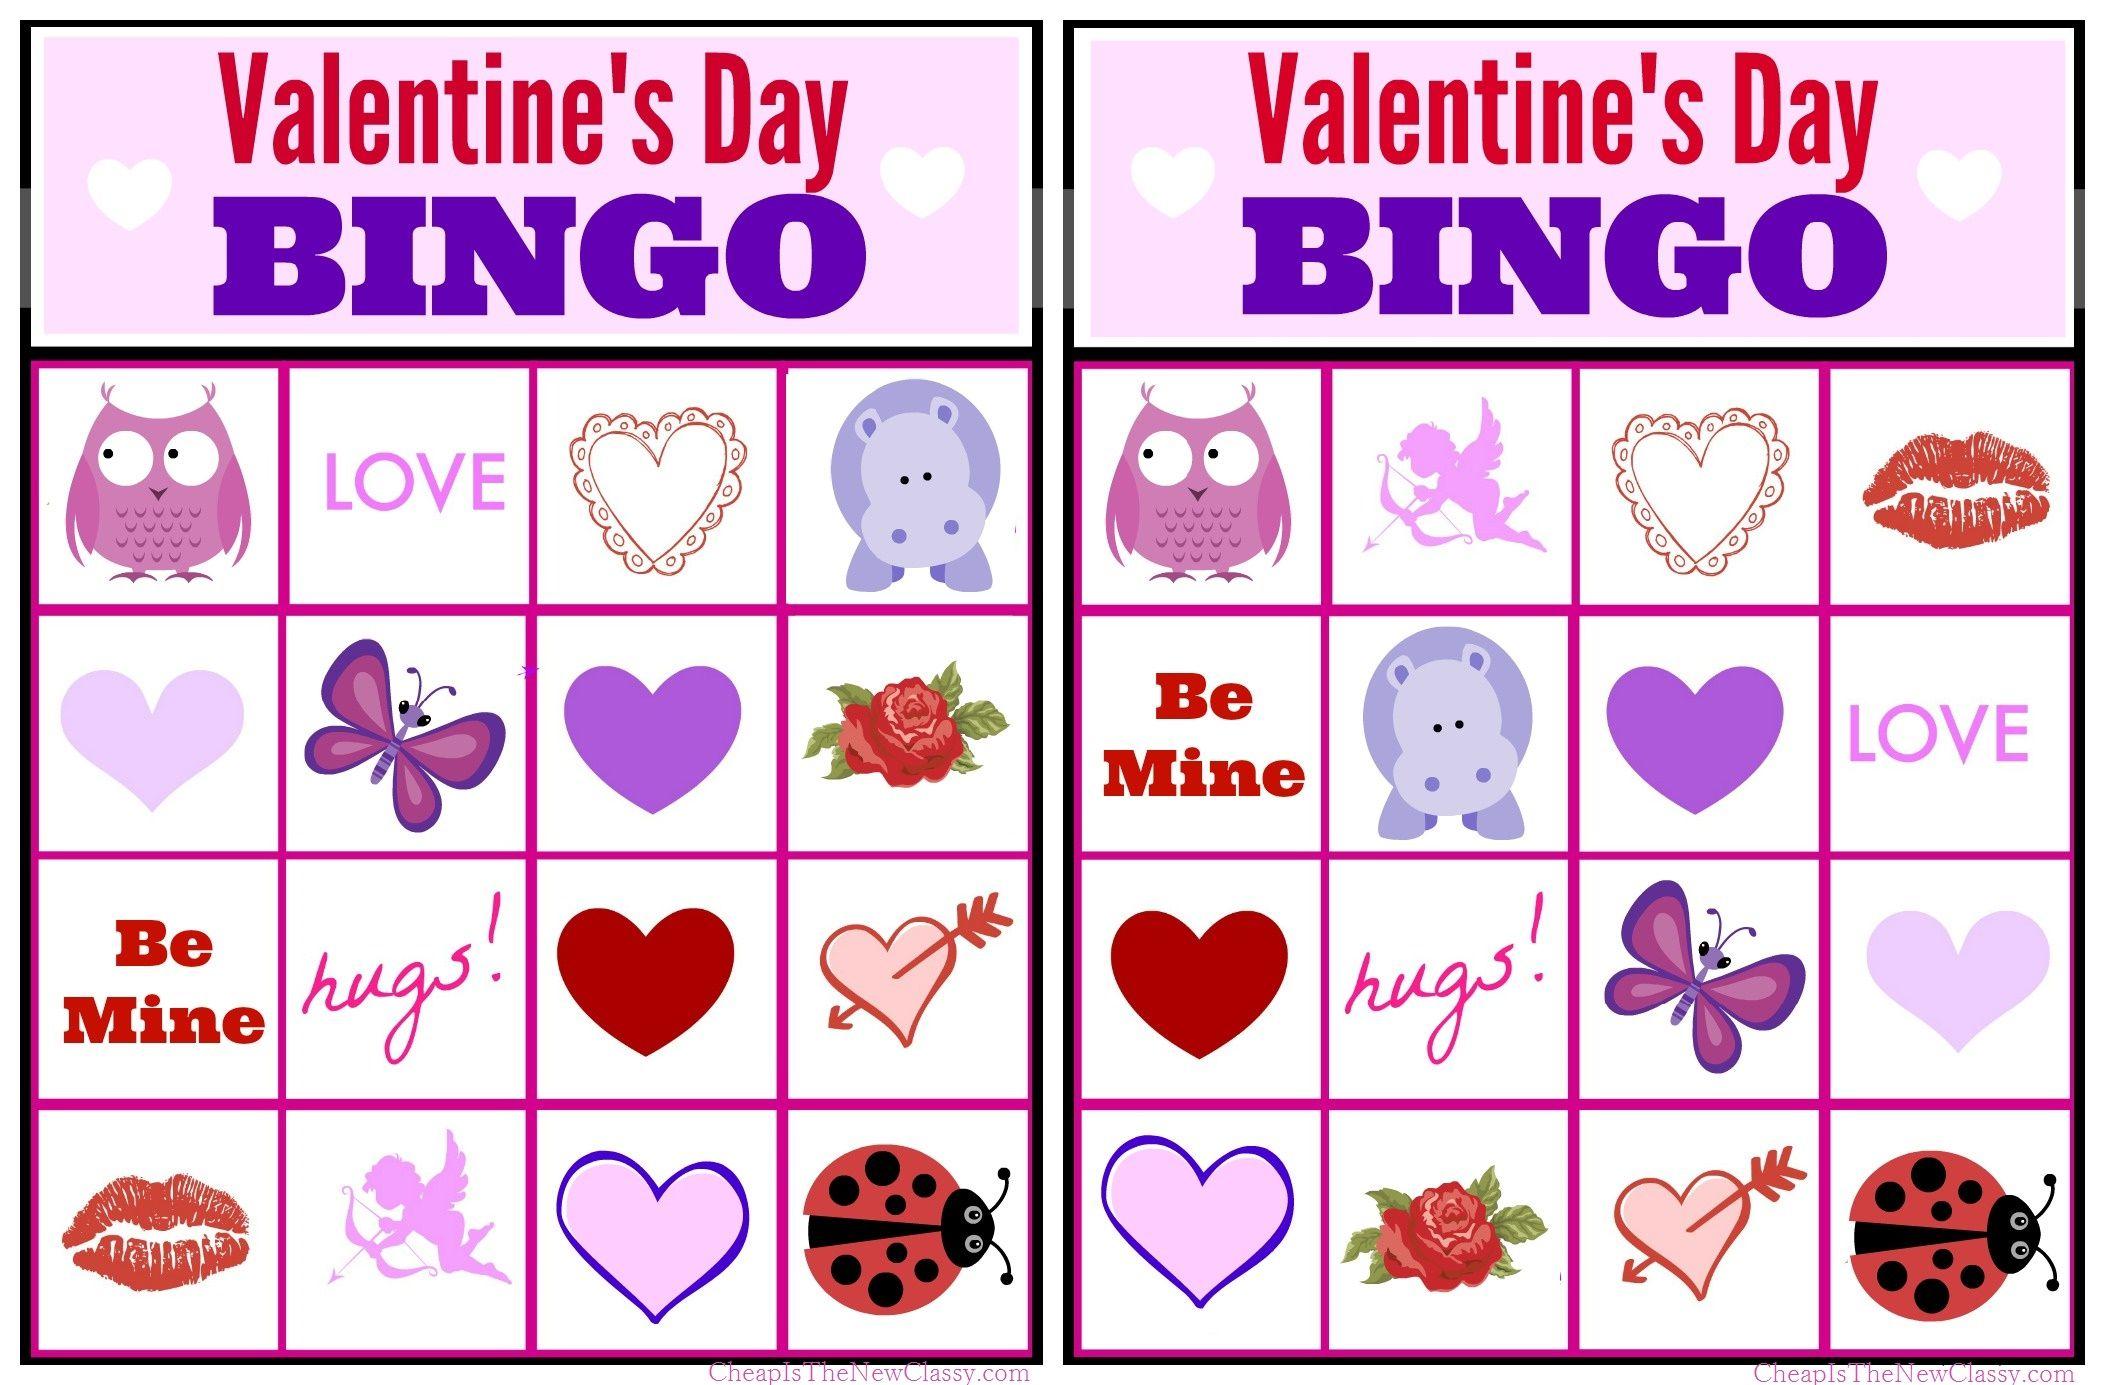 Valentines Day Ideas Valentine Bingo Game Printable For Kids